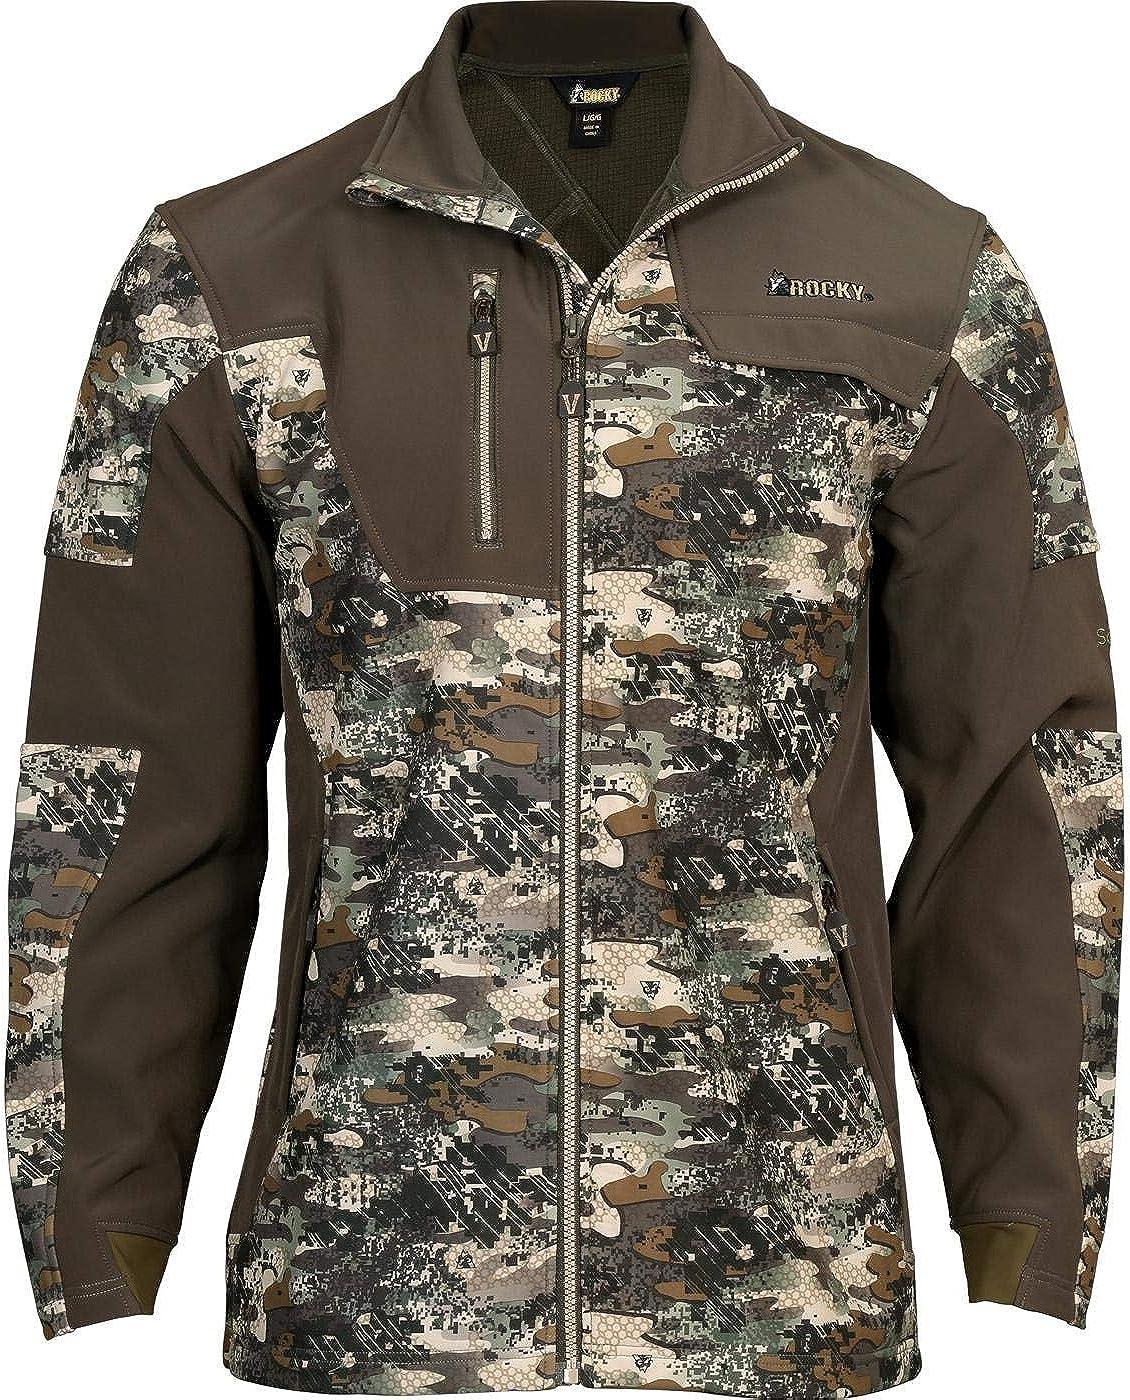 Rocky Men's Venator Camouflage 2-Layer Jacket